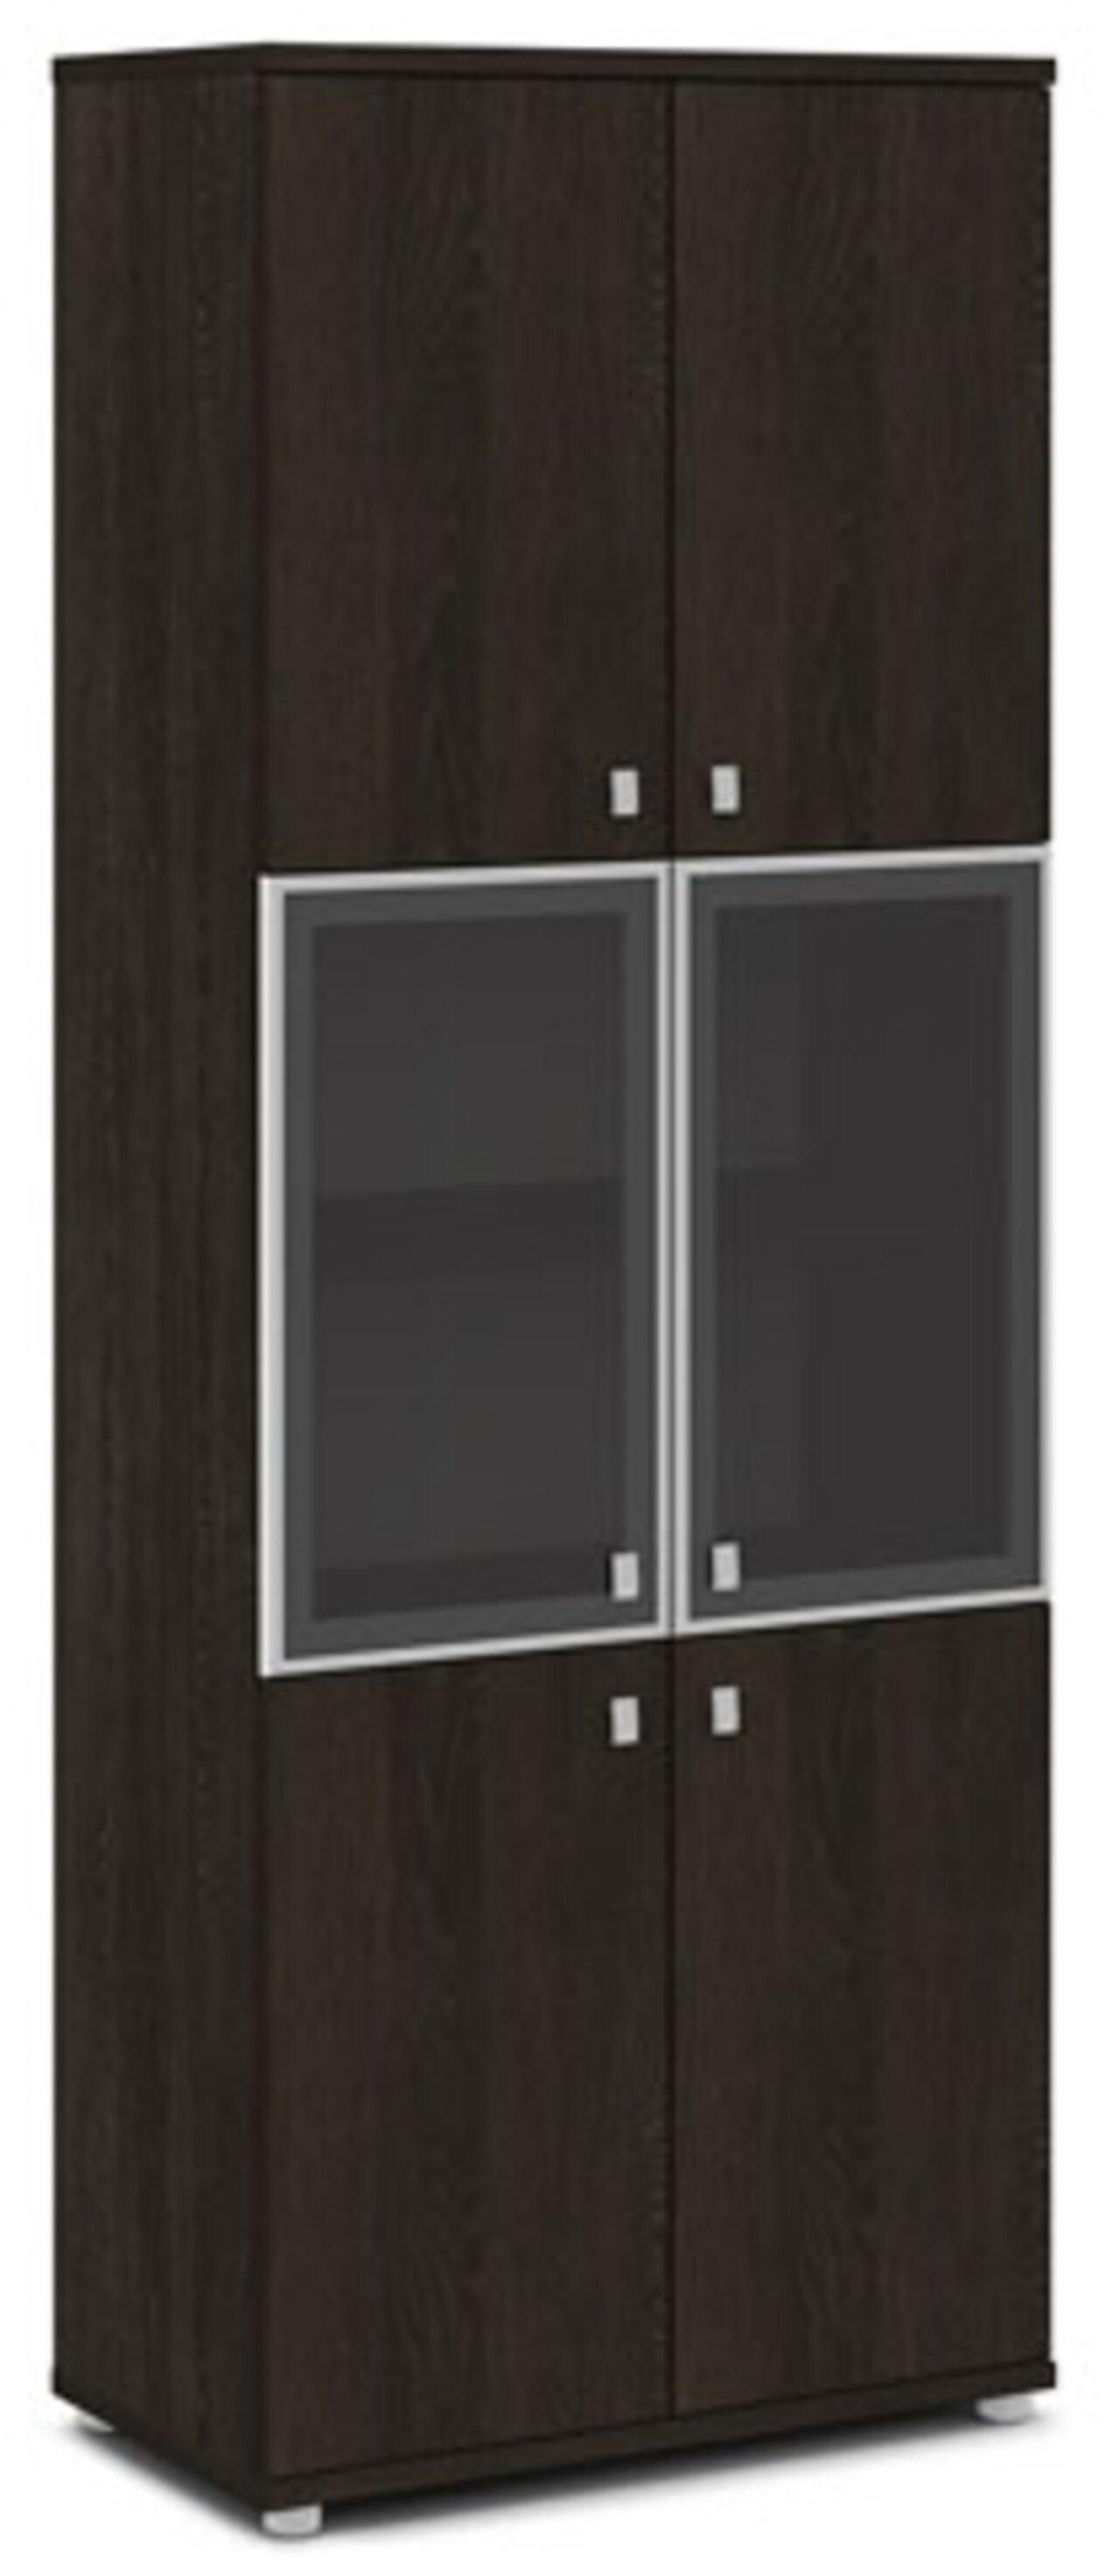 Шкаф со стеклом в алюминиевом профиле  Vasanta 82x44x220 - фото 1